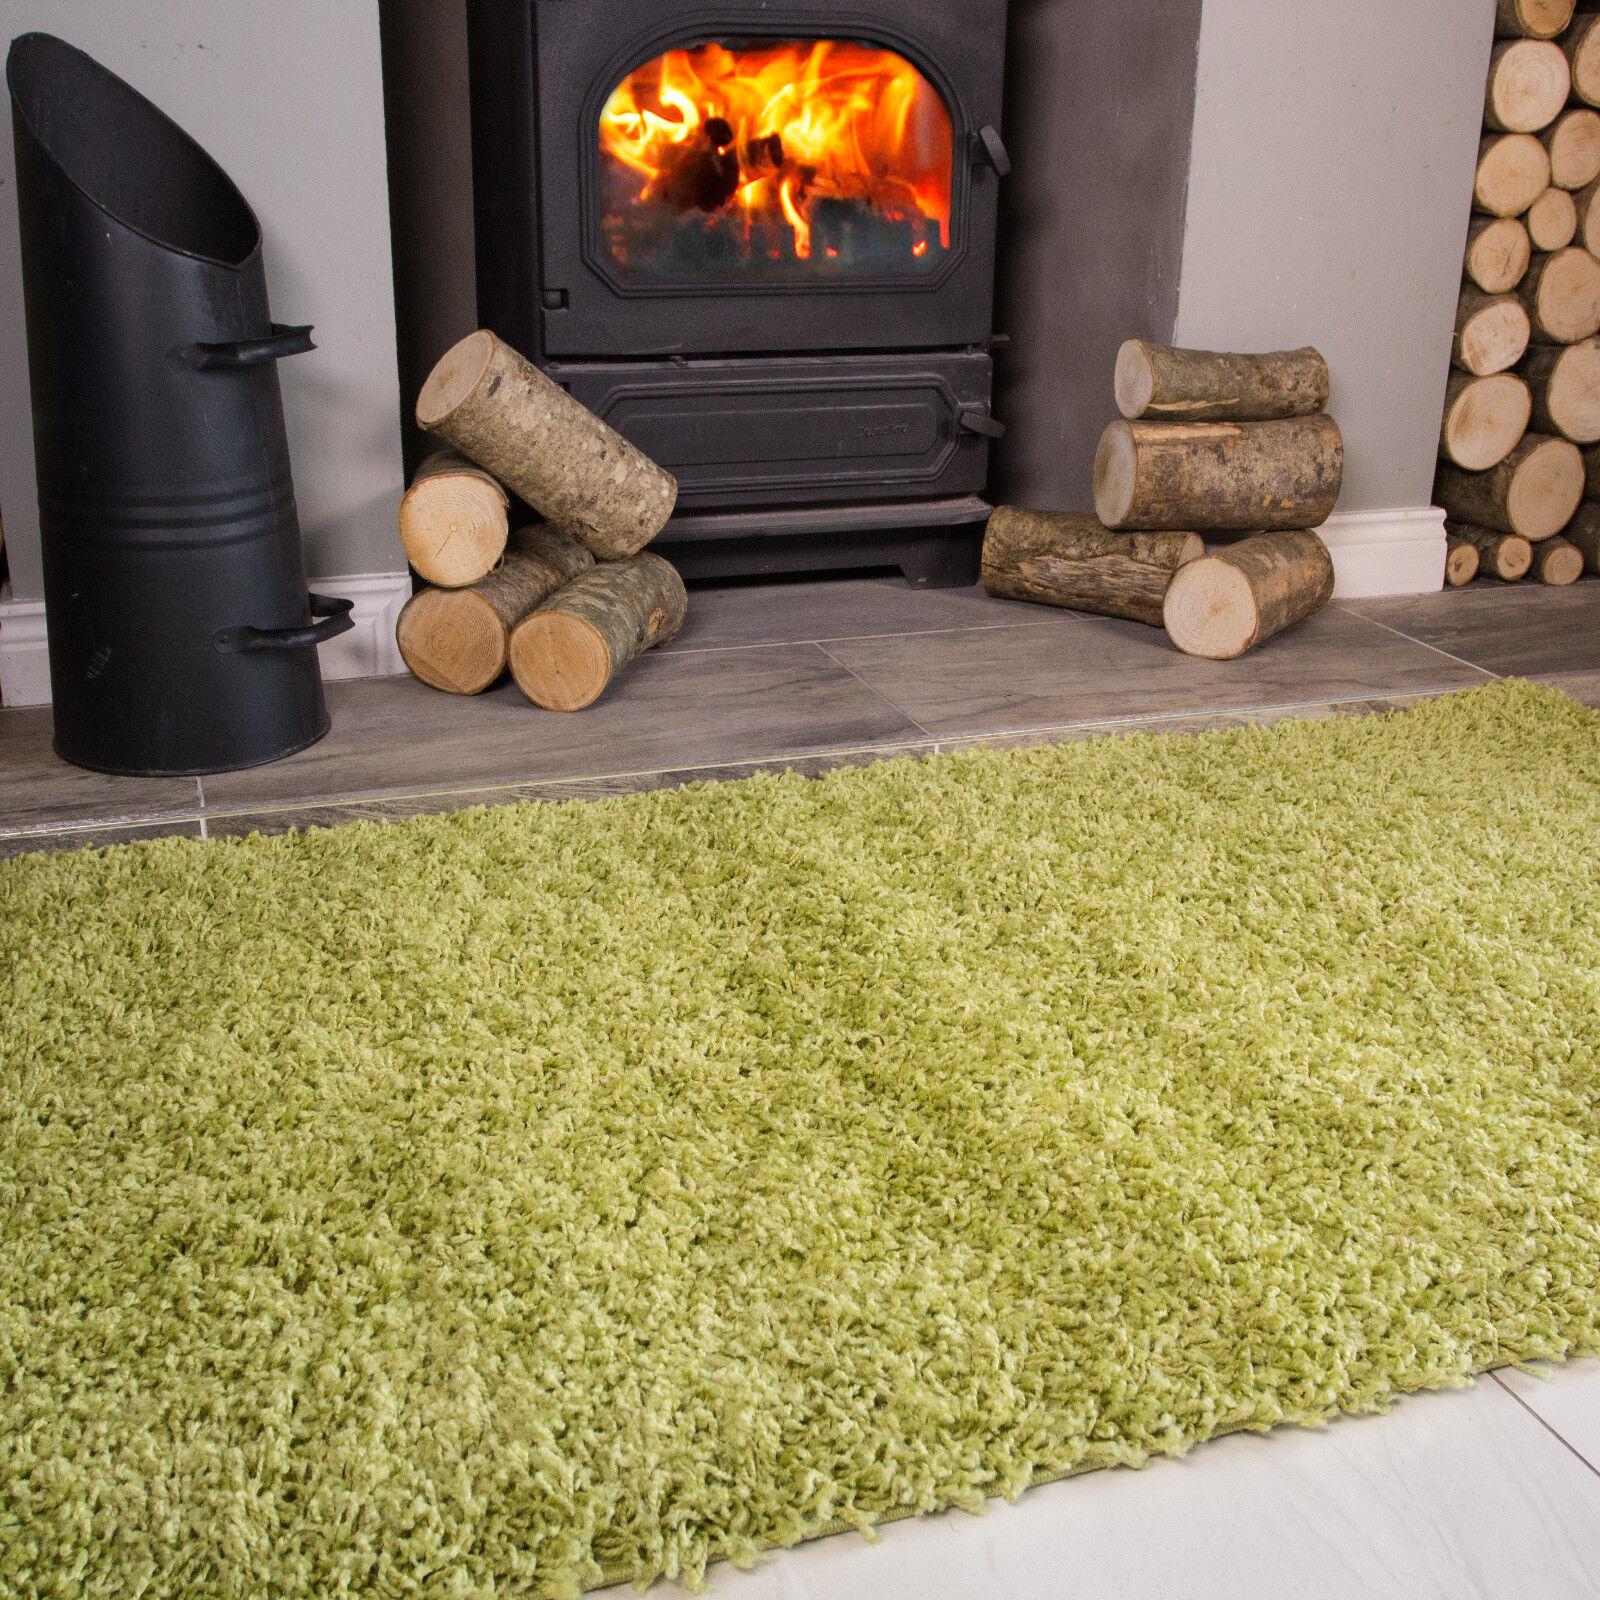 Moss Grass Earthy Grün Warm Shaggy Pile Area Rug Living Living Living Room Bedroom Floor Rugs a5a453